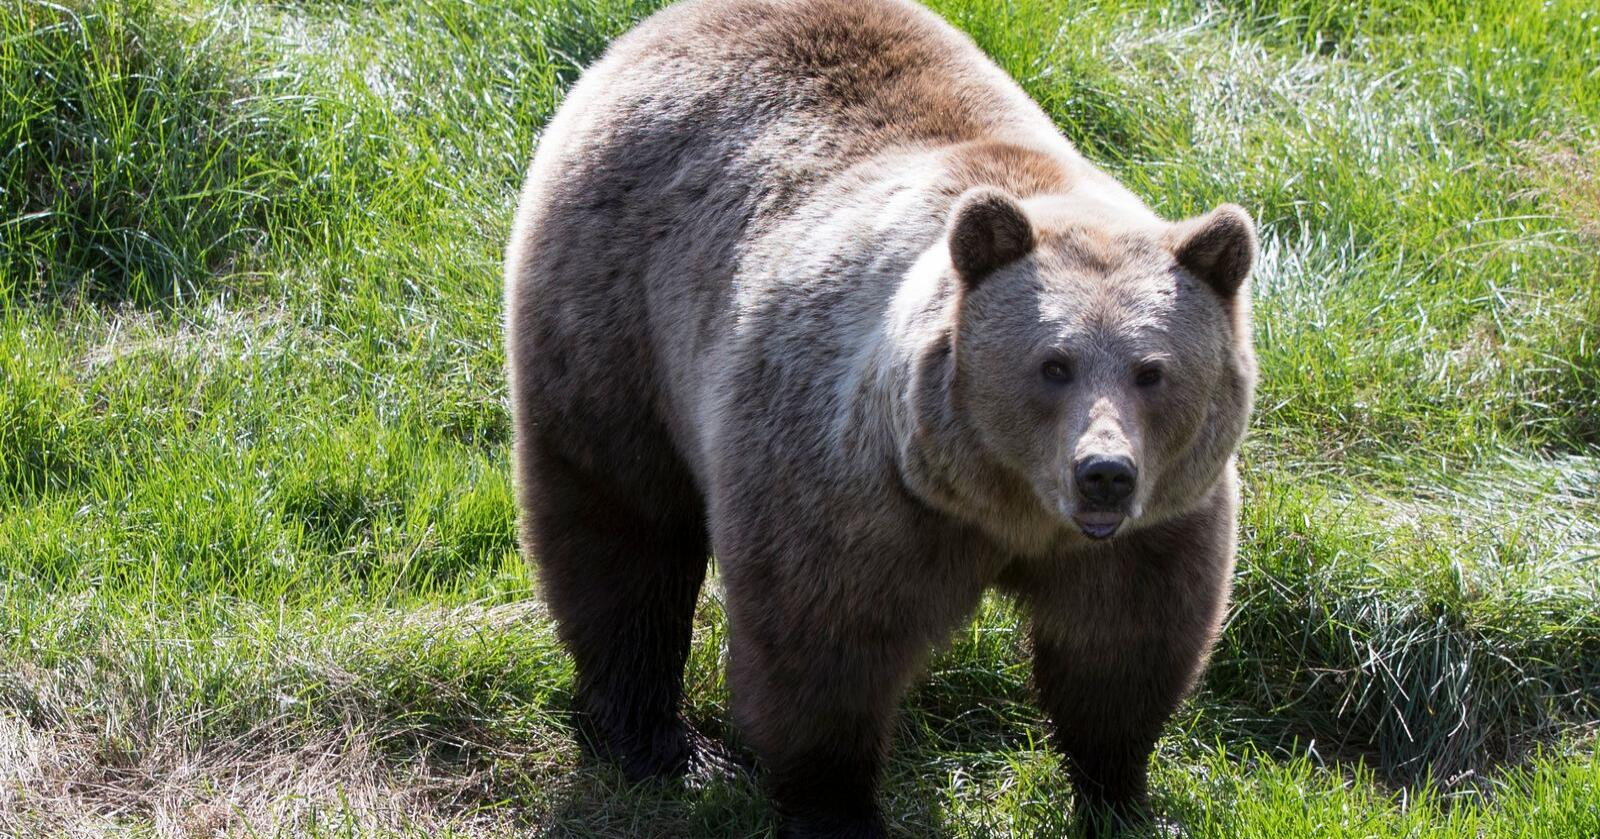 Bjørn i Namsskogan familiepark. Foto: Berit Roald / NTB scanpix